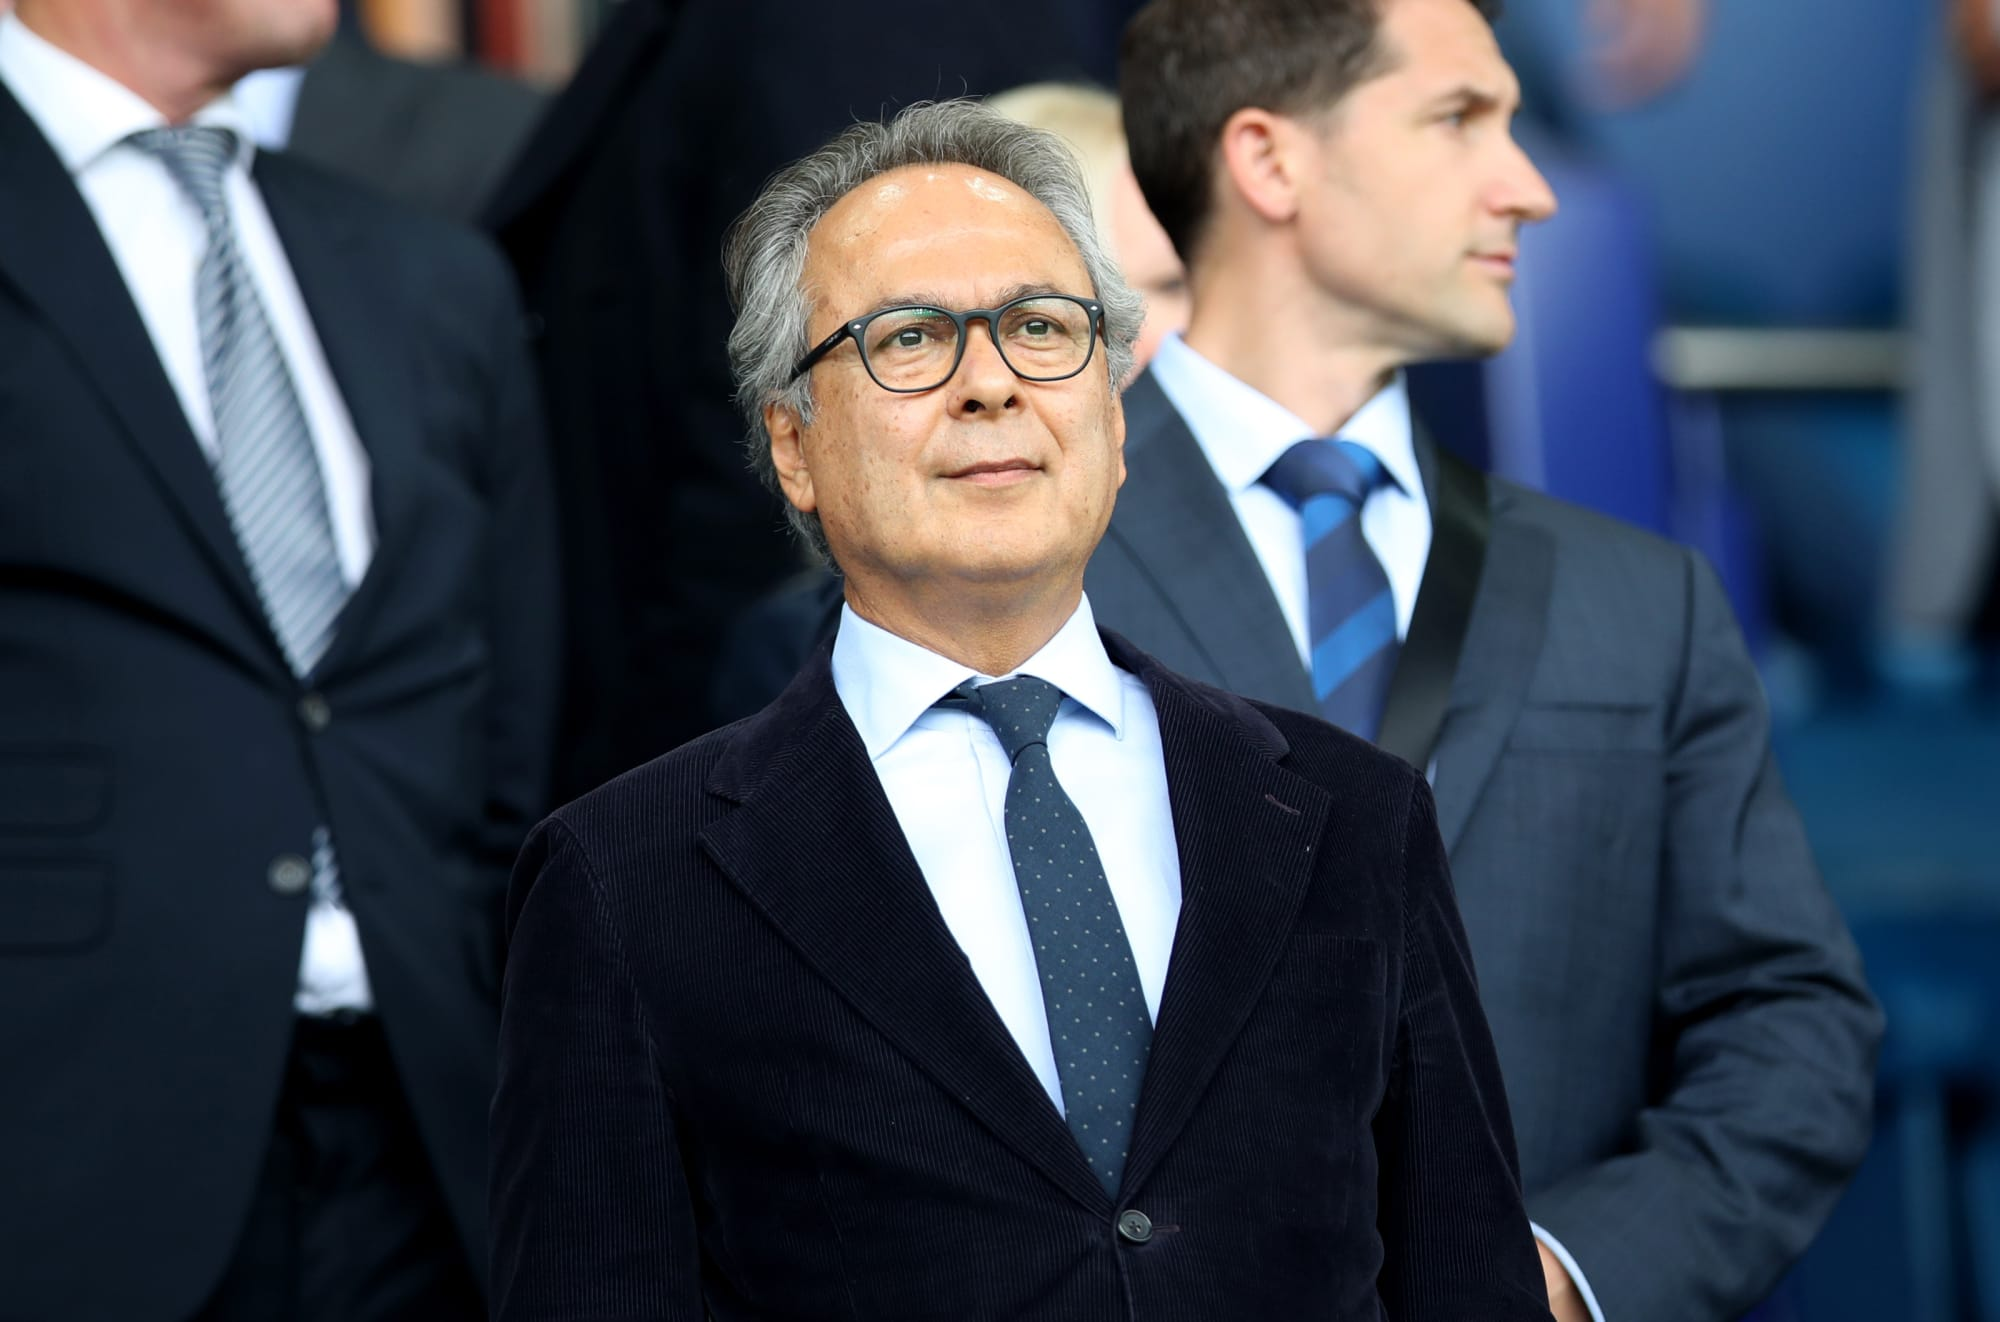 Everton squad revealed as most expensive outside Premier League's top six